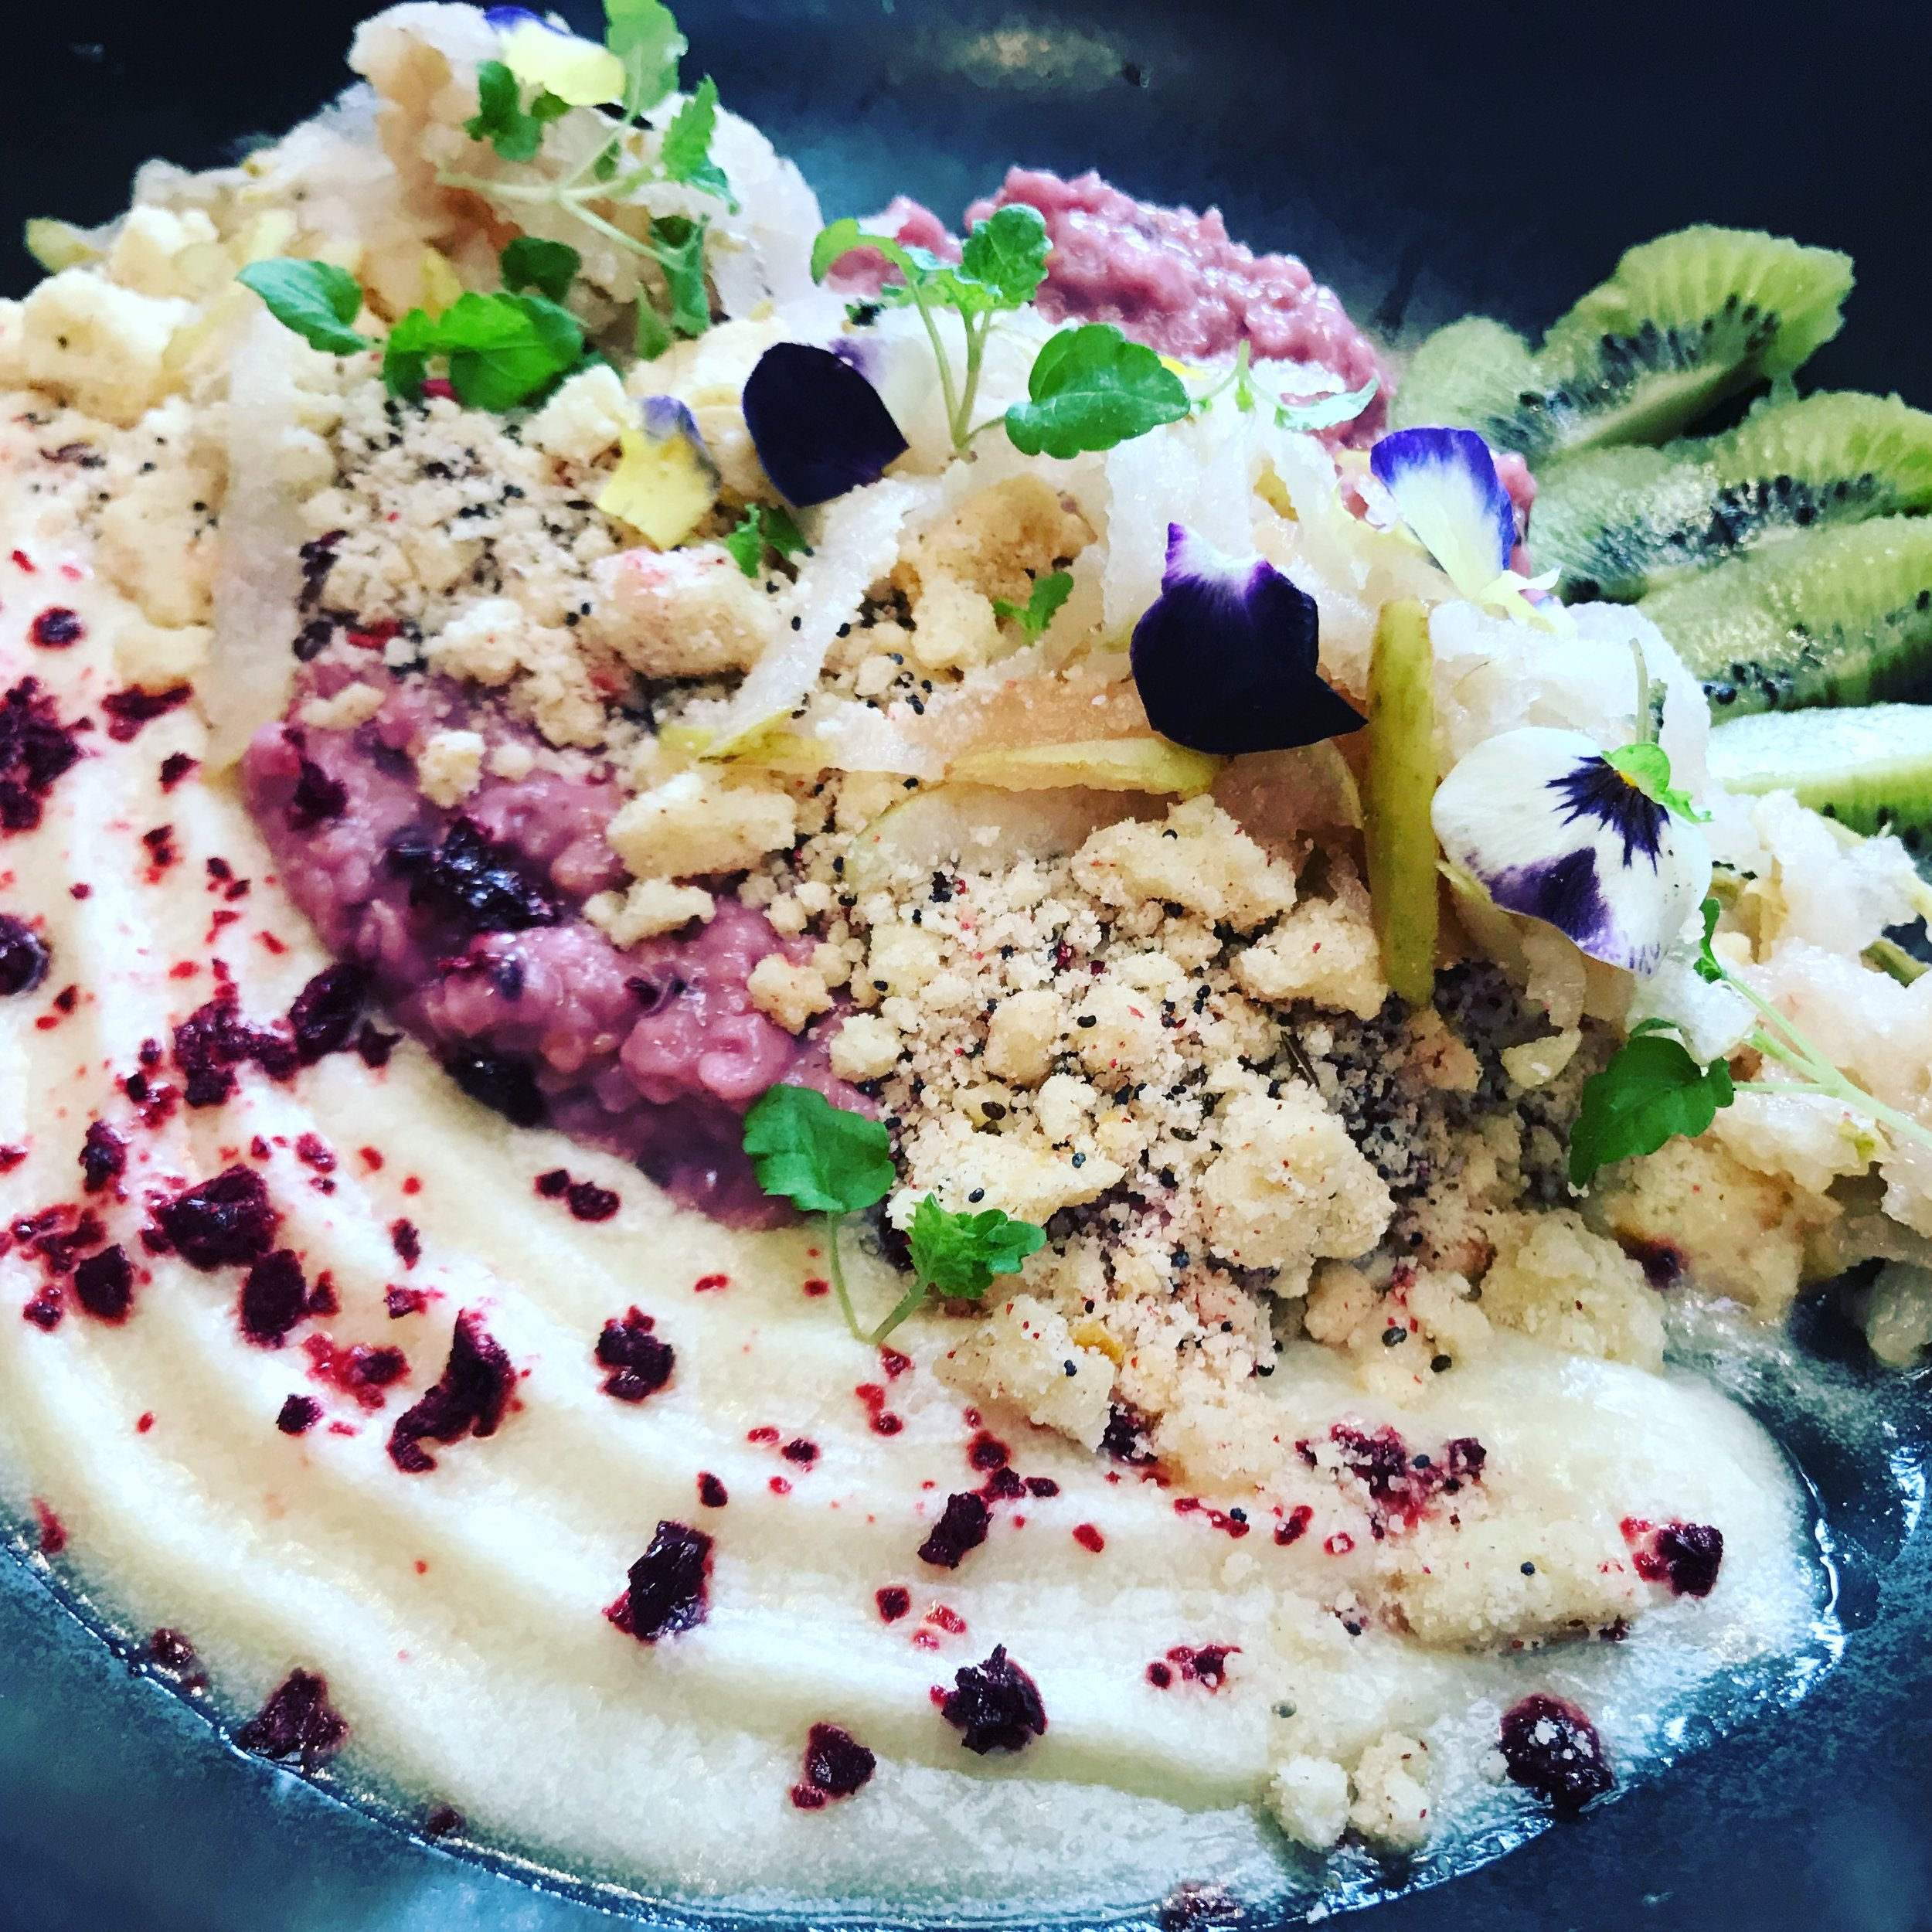 australia-melbourne-adelaide-fusion-foodie-restaurants-recommendations